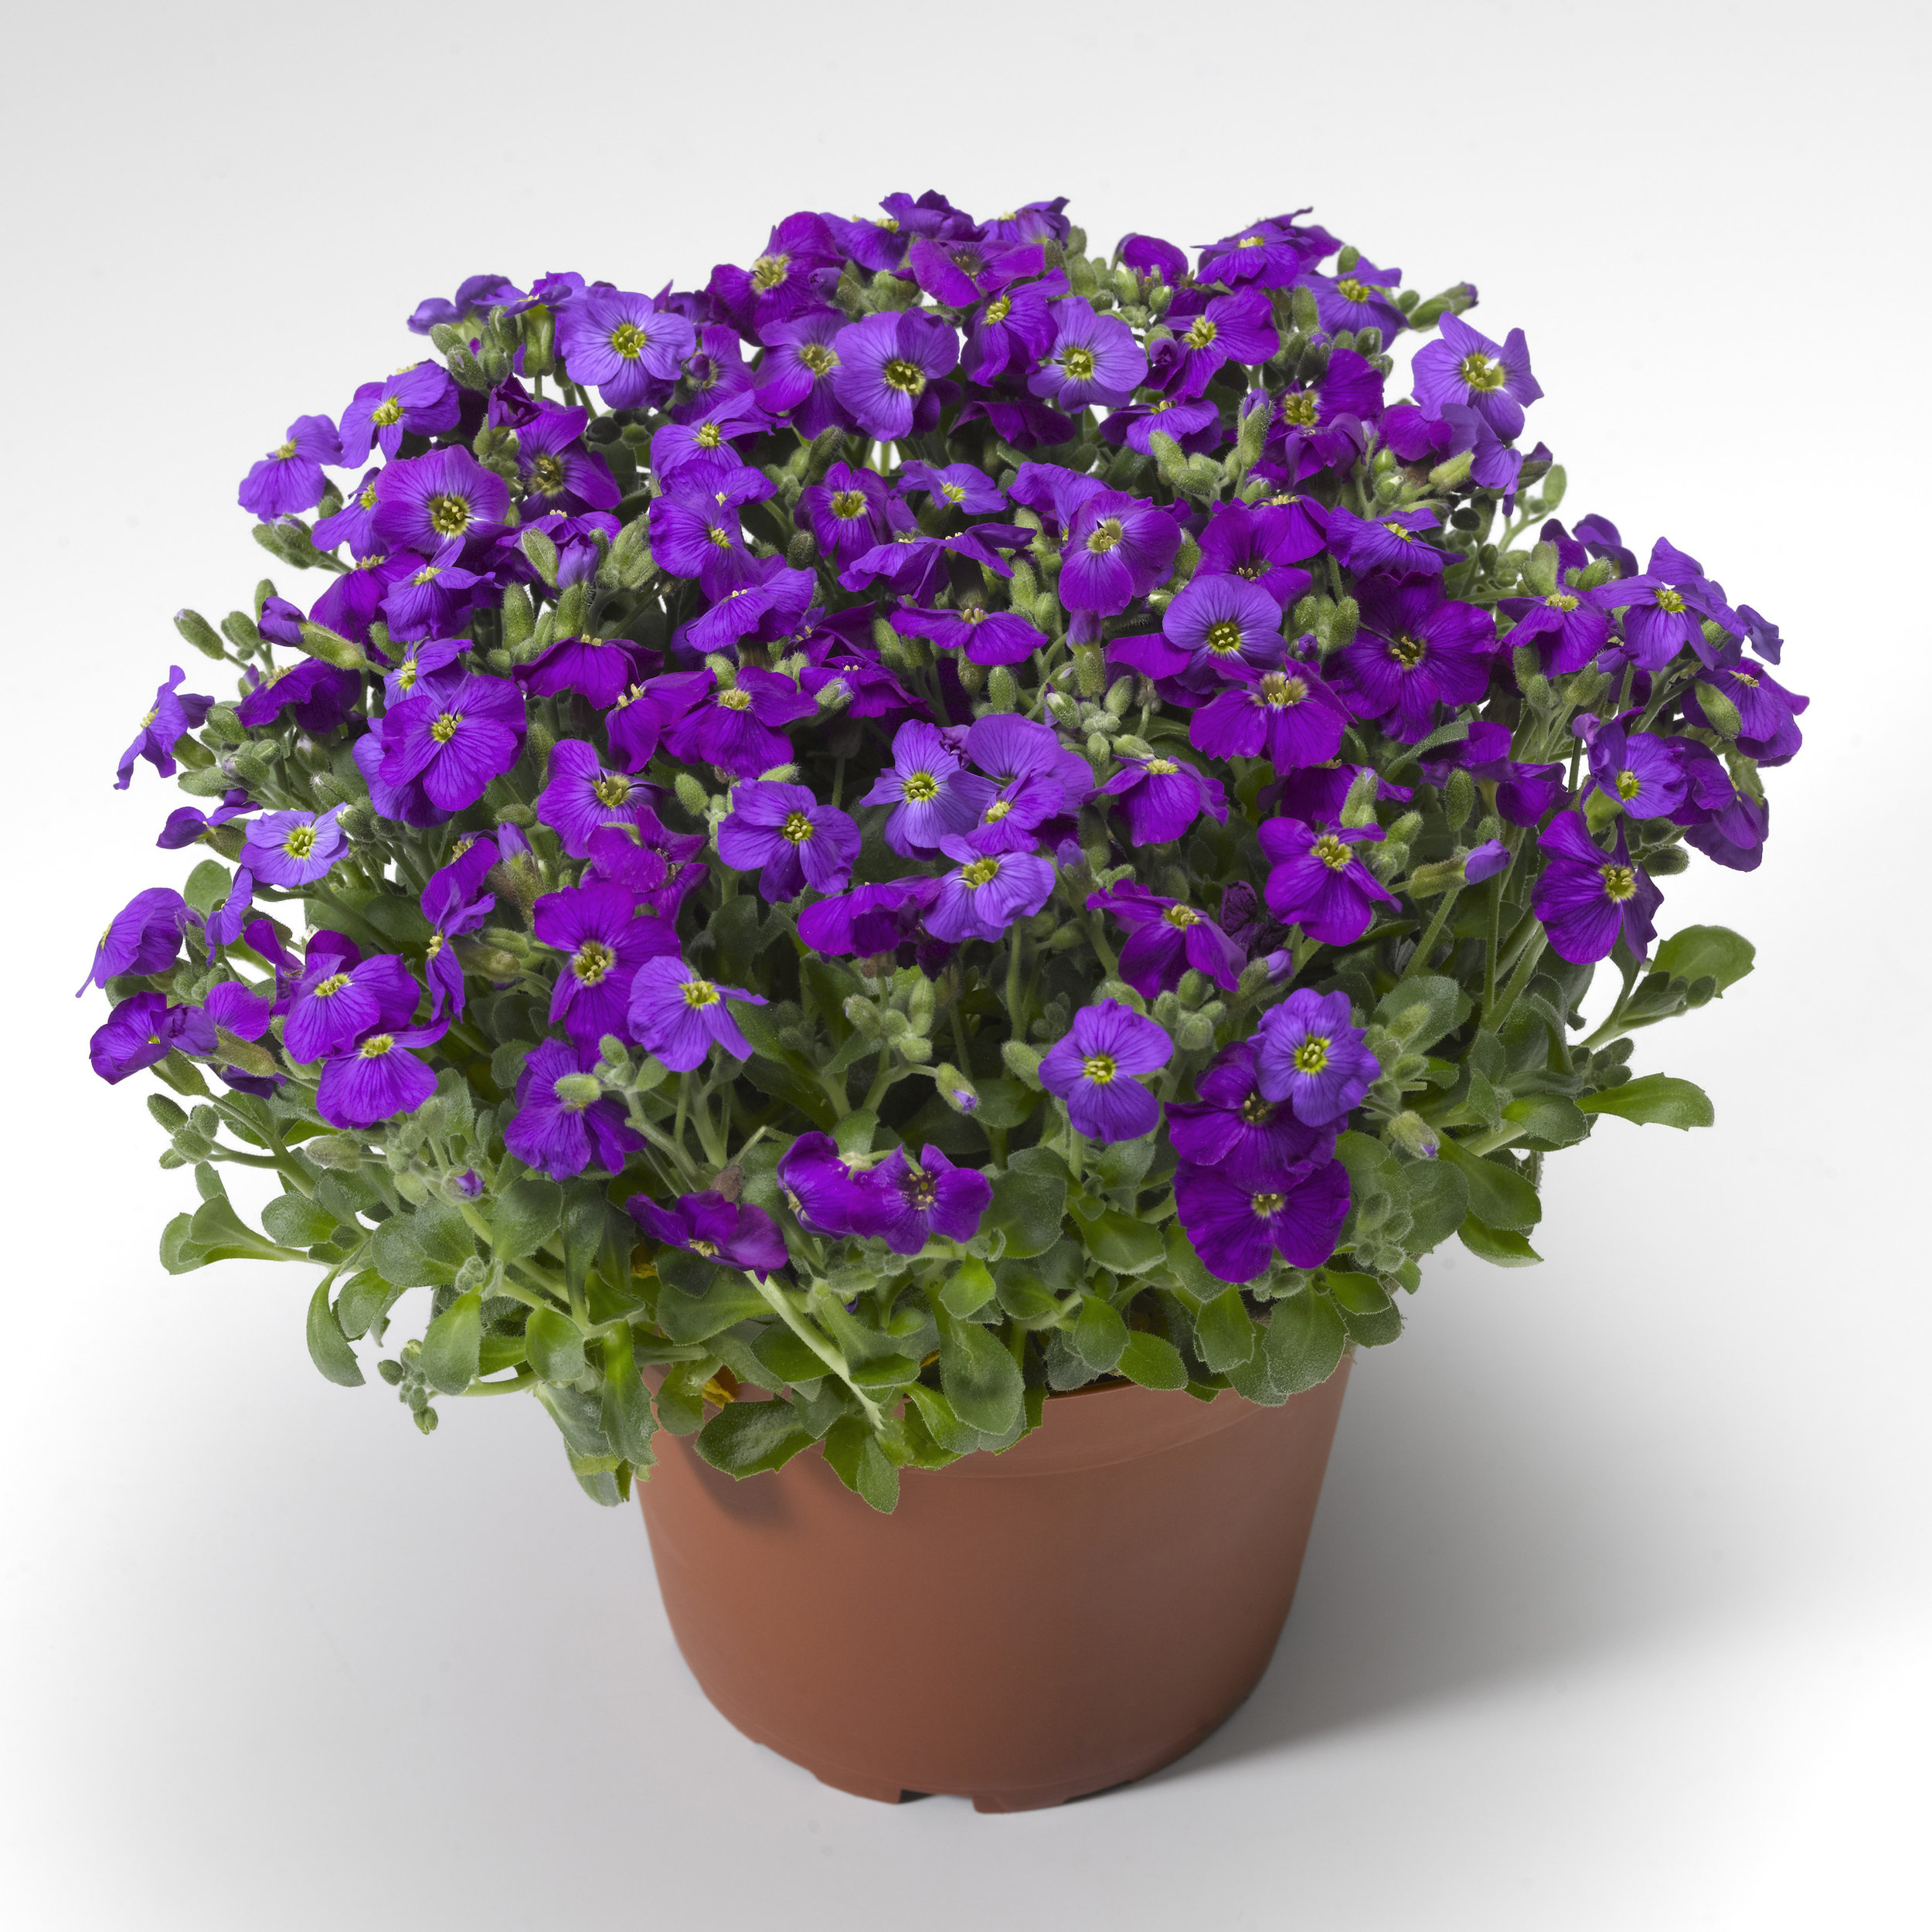 HR_Seed_Aubrieta_Audrey™_Audrey™_Deep_Blue_Shades_70028029_2.jpg